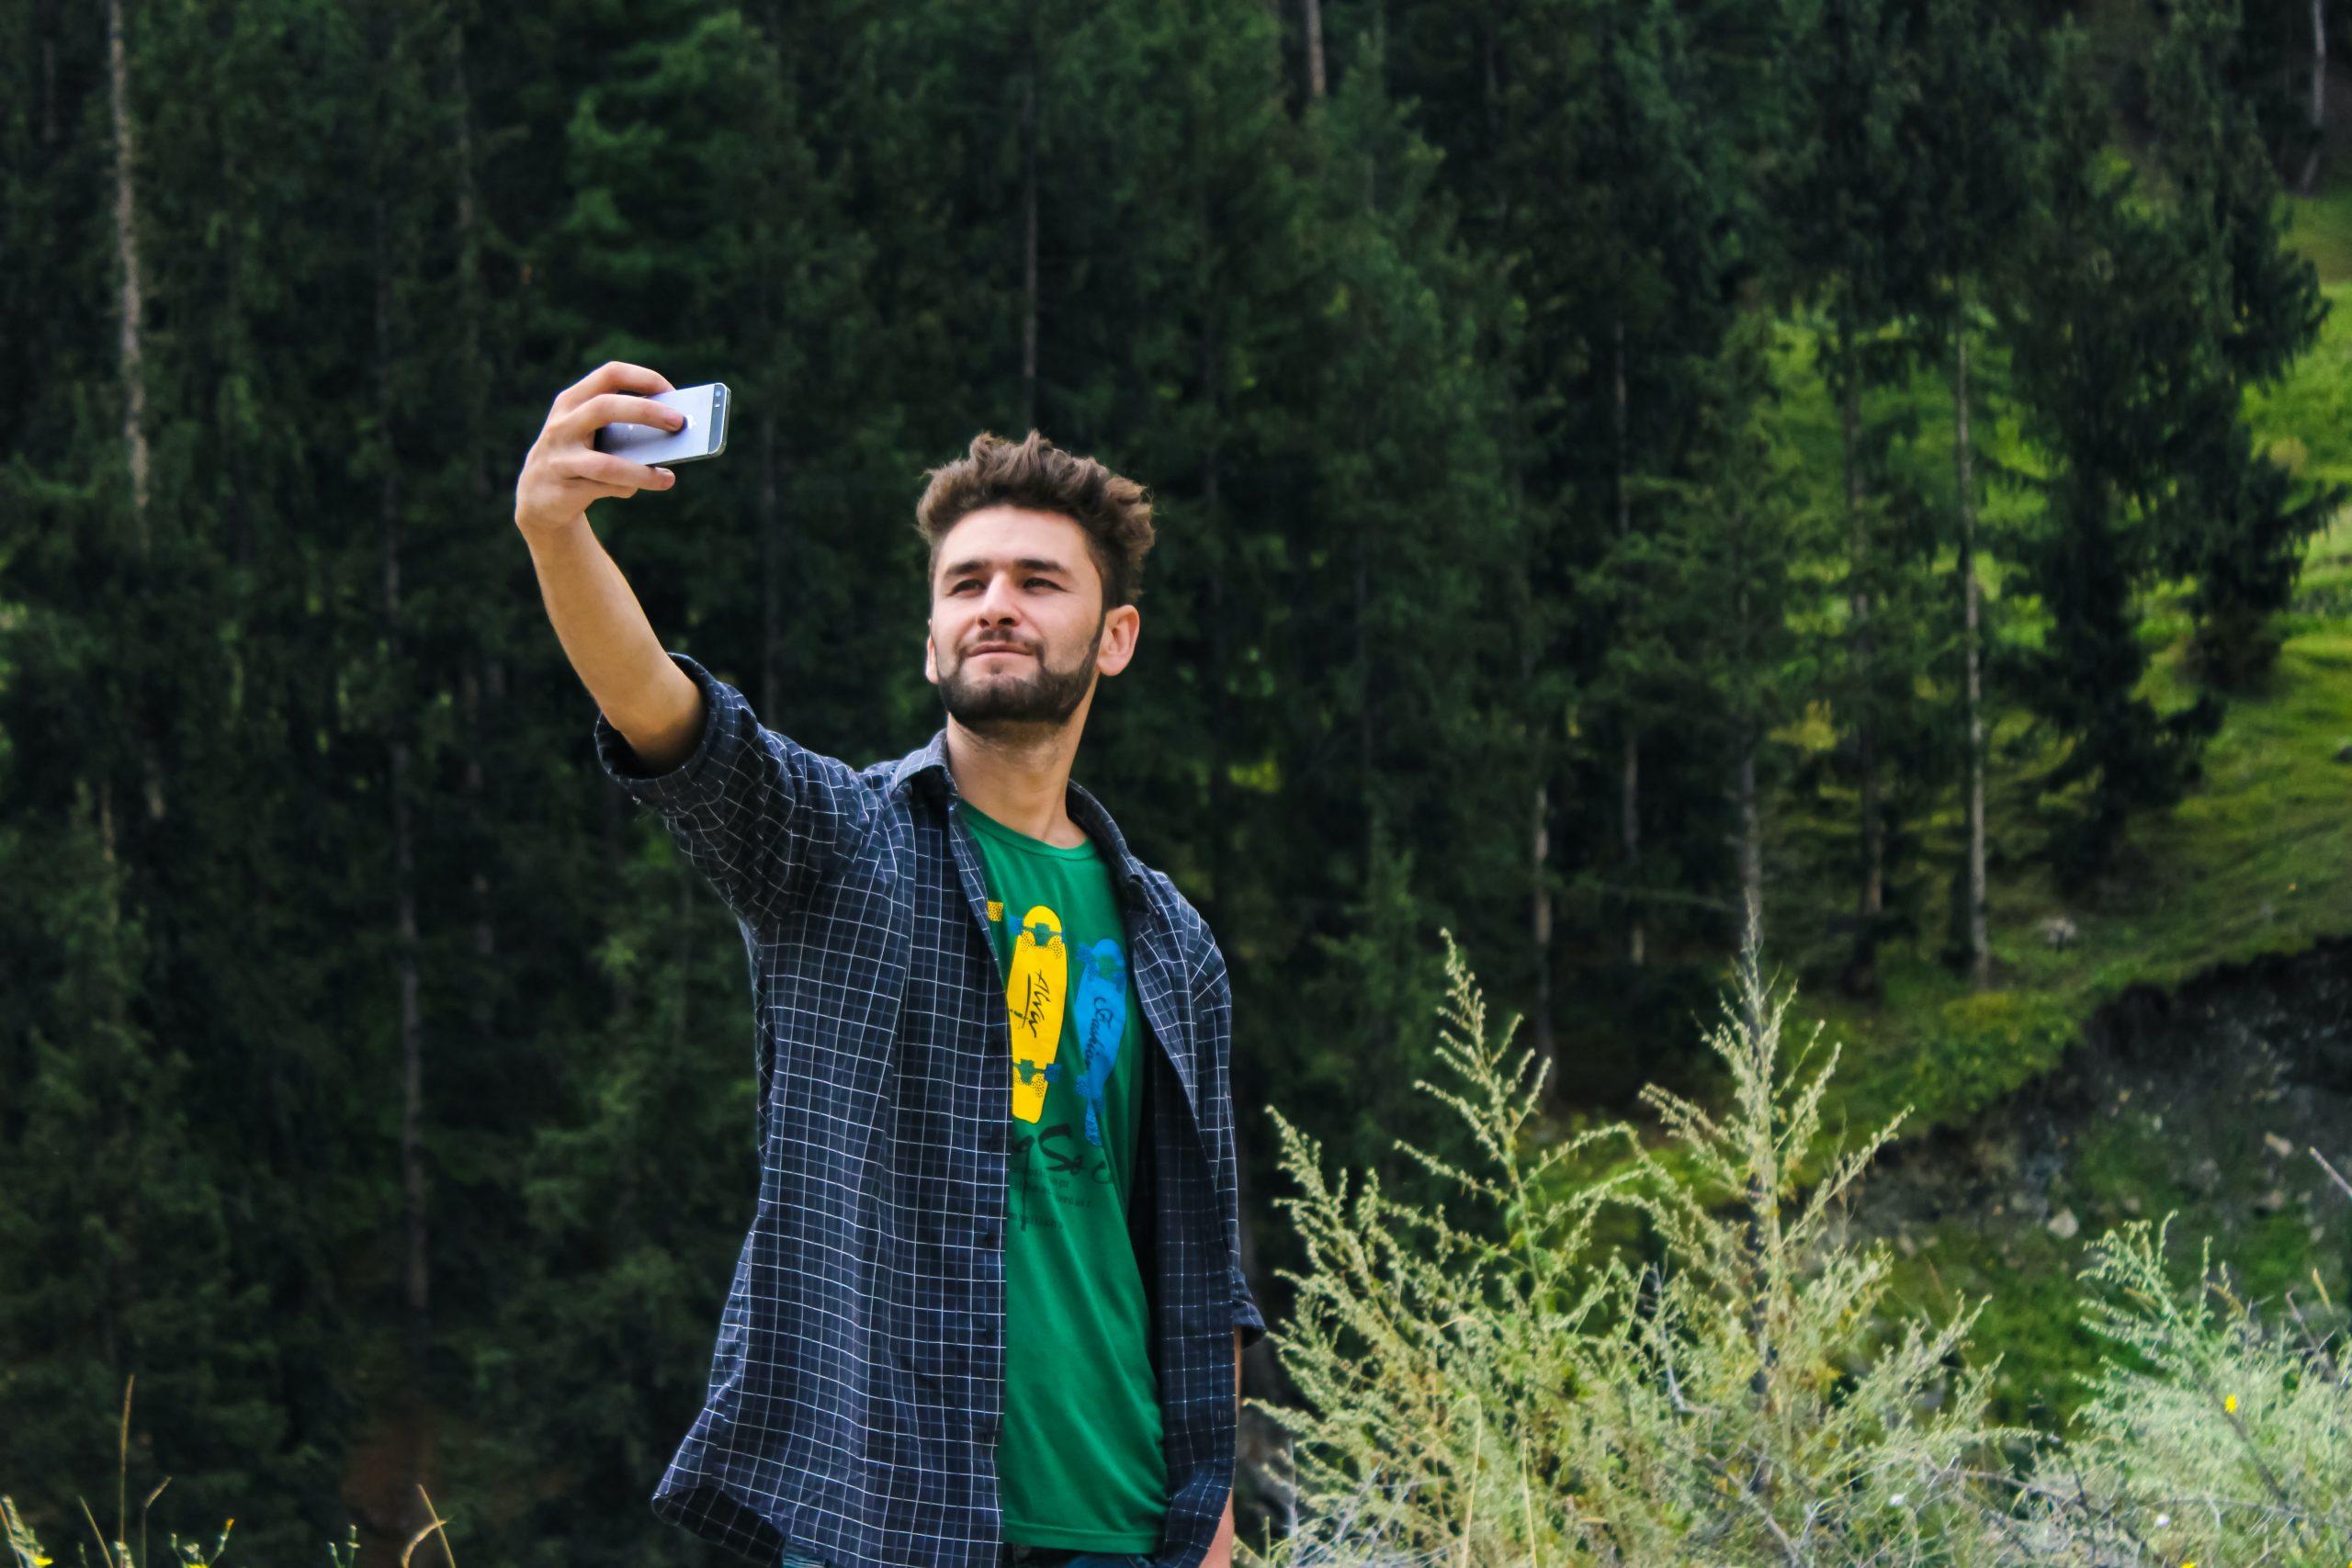 pexels farhan ullah baig 1053845 scaled - 11 dicas pra tirar a selfie perfeita